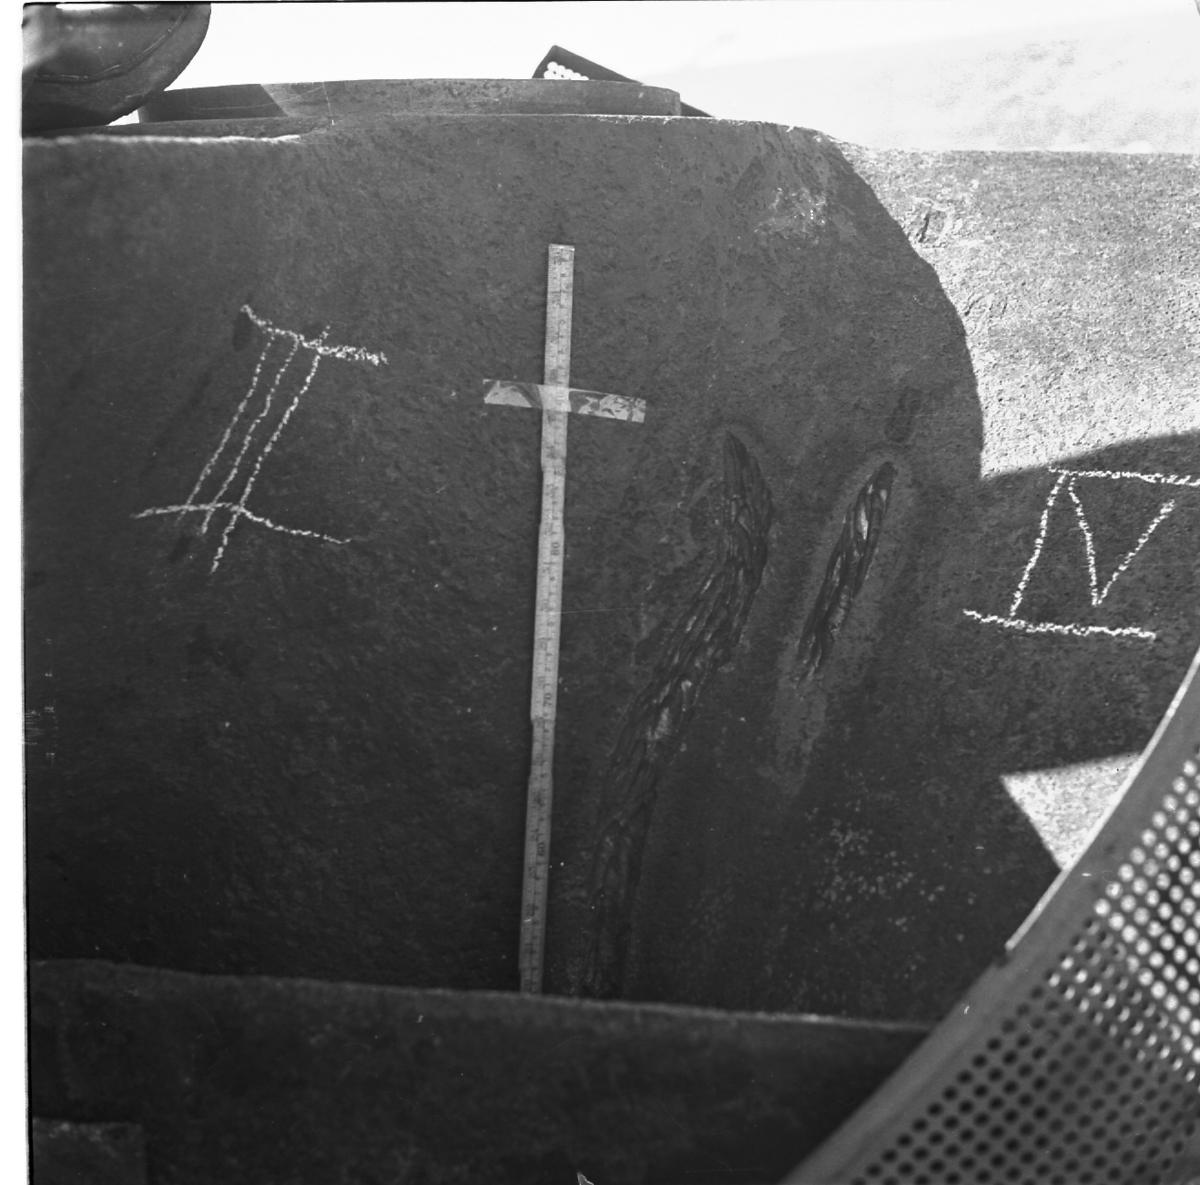 Fartyg: YMER                            Övrigt: Isbrytaren Ymers propeller